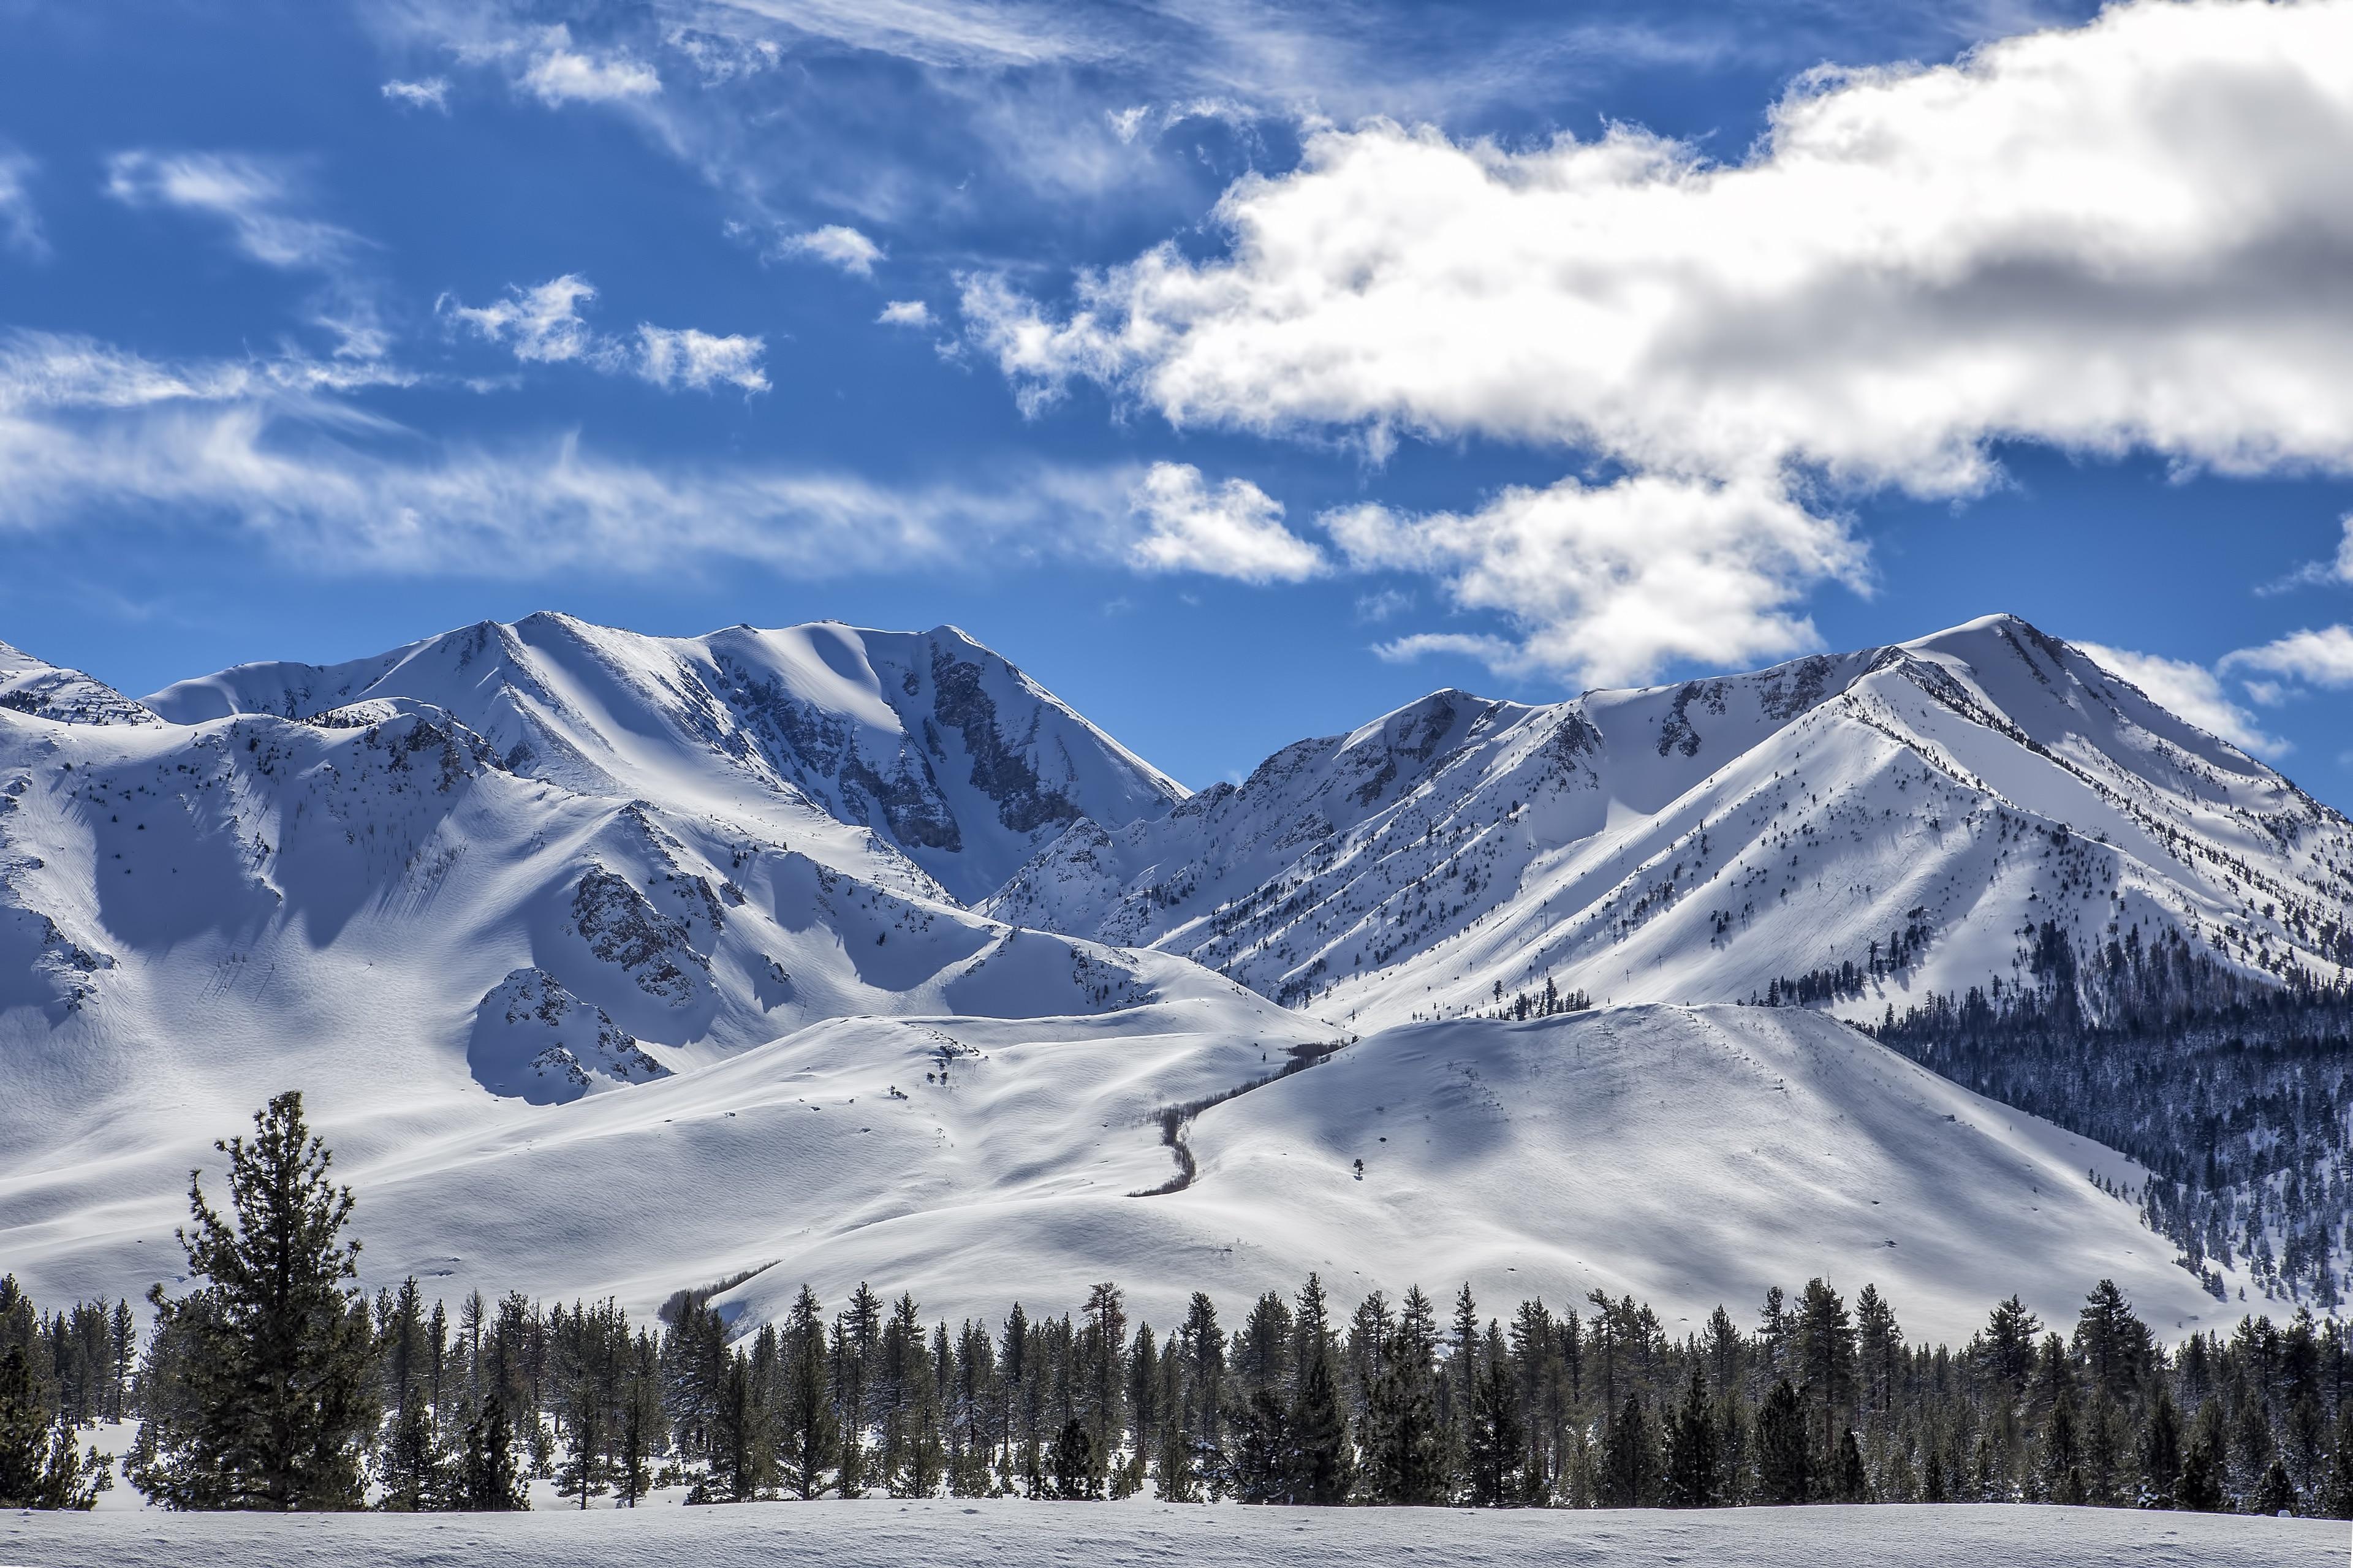 Mammoth Mountain, Mammoth Lakes, California, United States of America